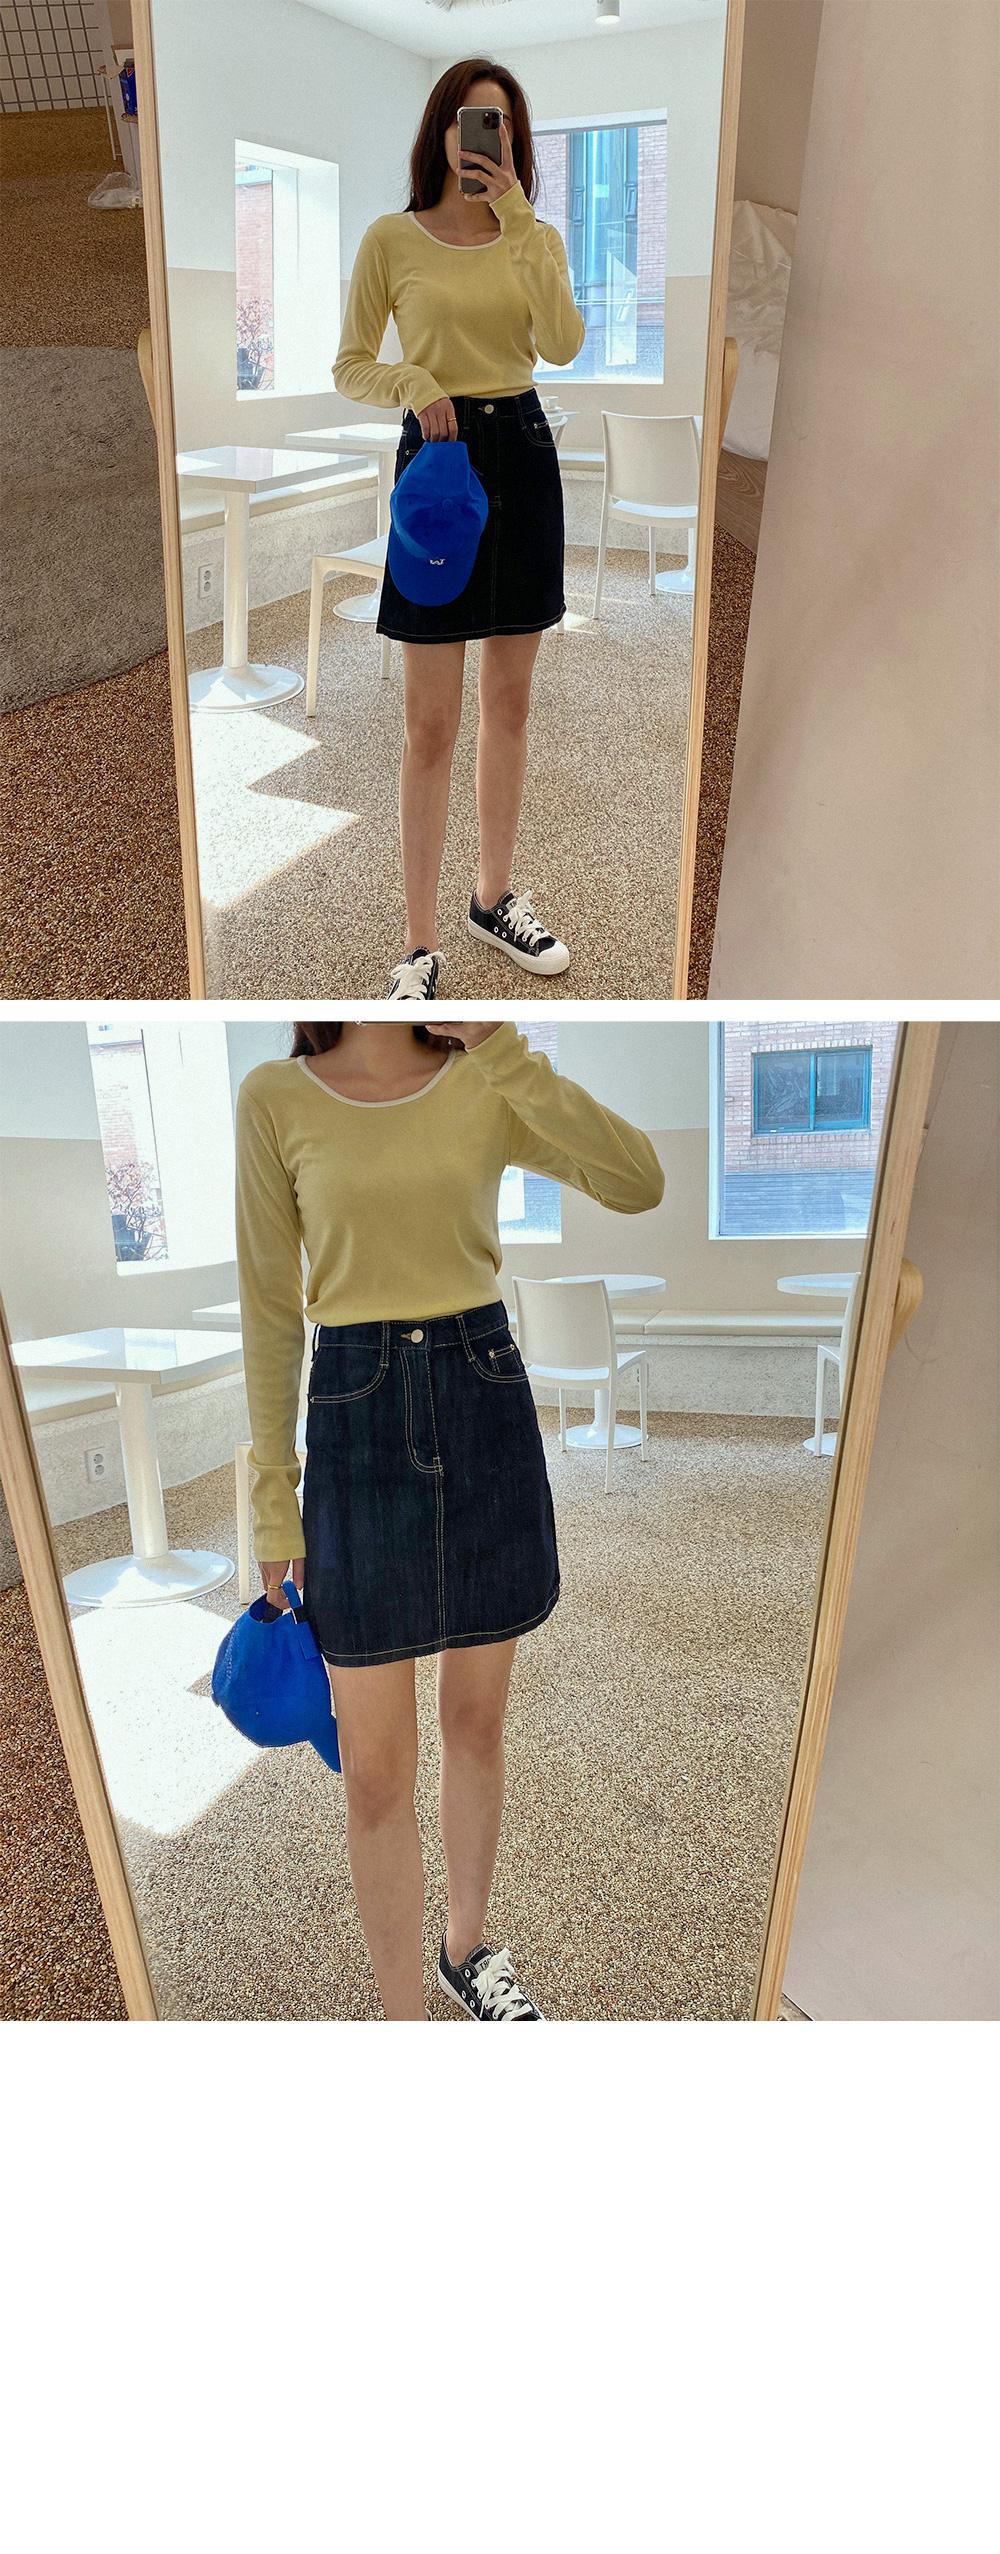 Dough mini skirt